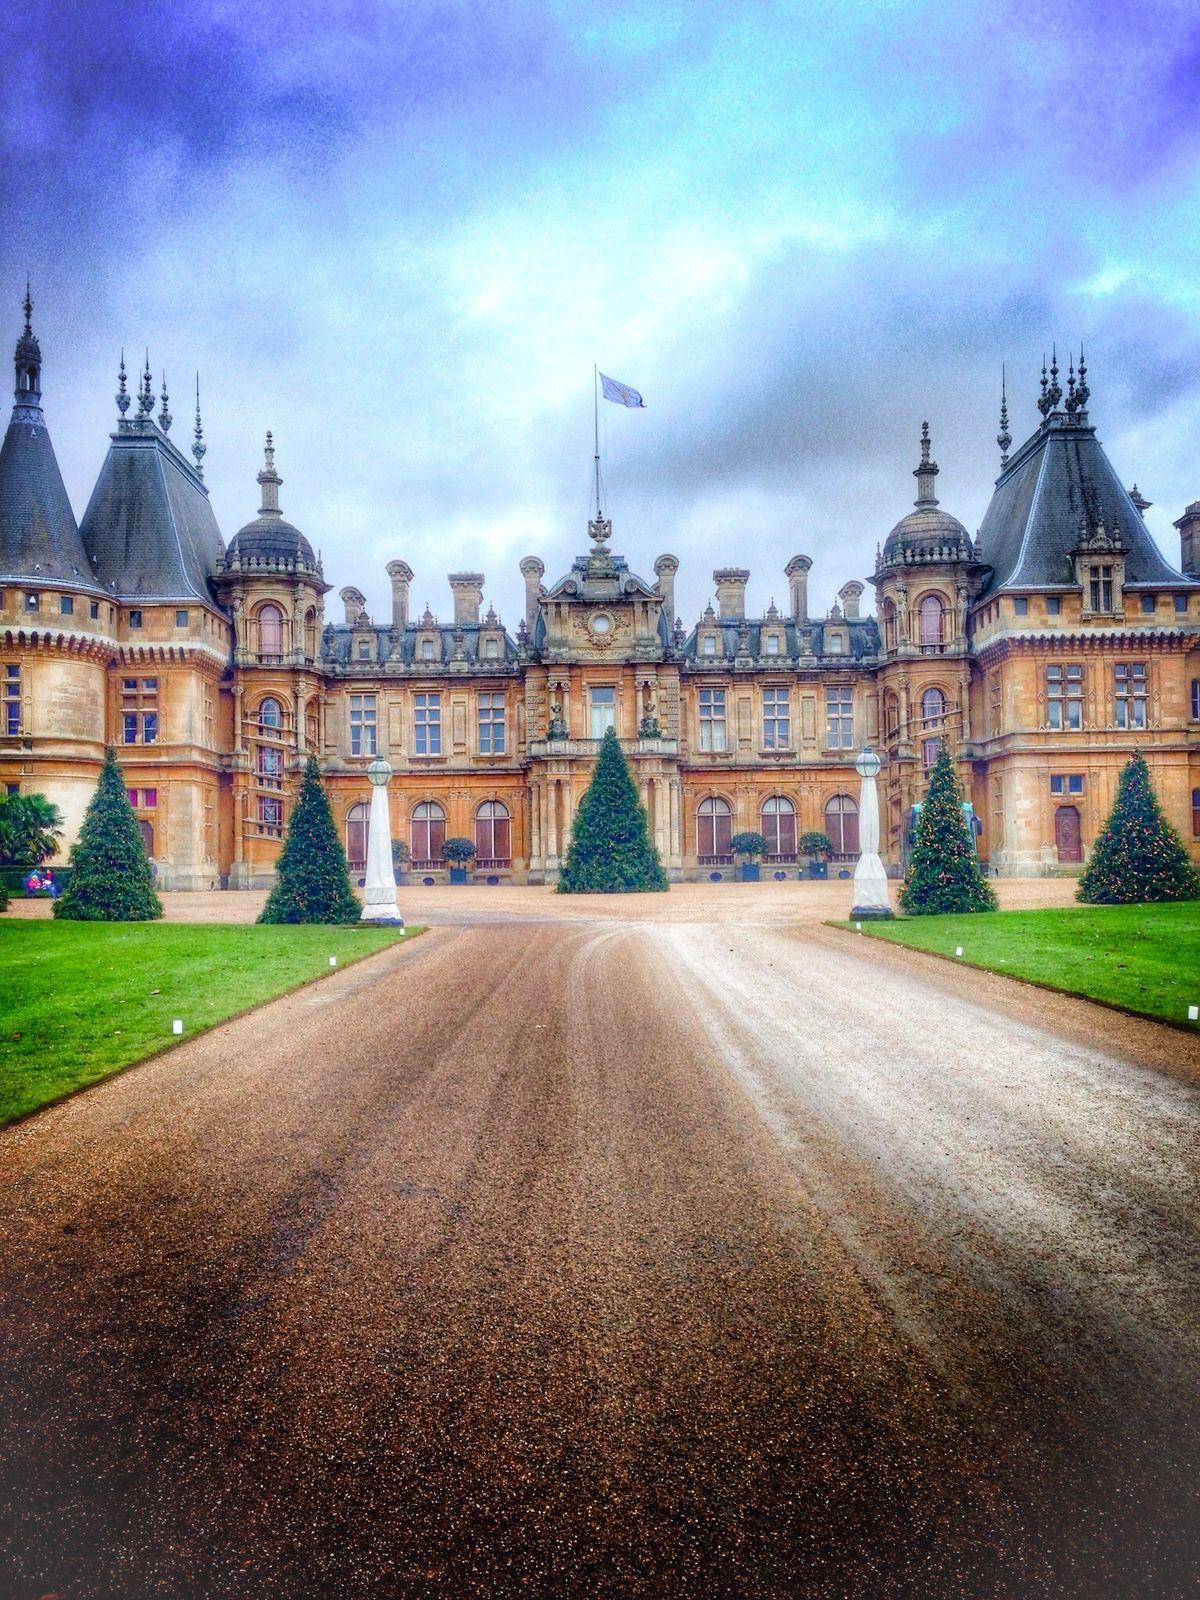 Waddesdon Manor, Aylesbury, England.